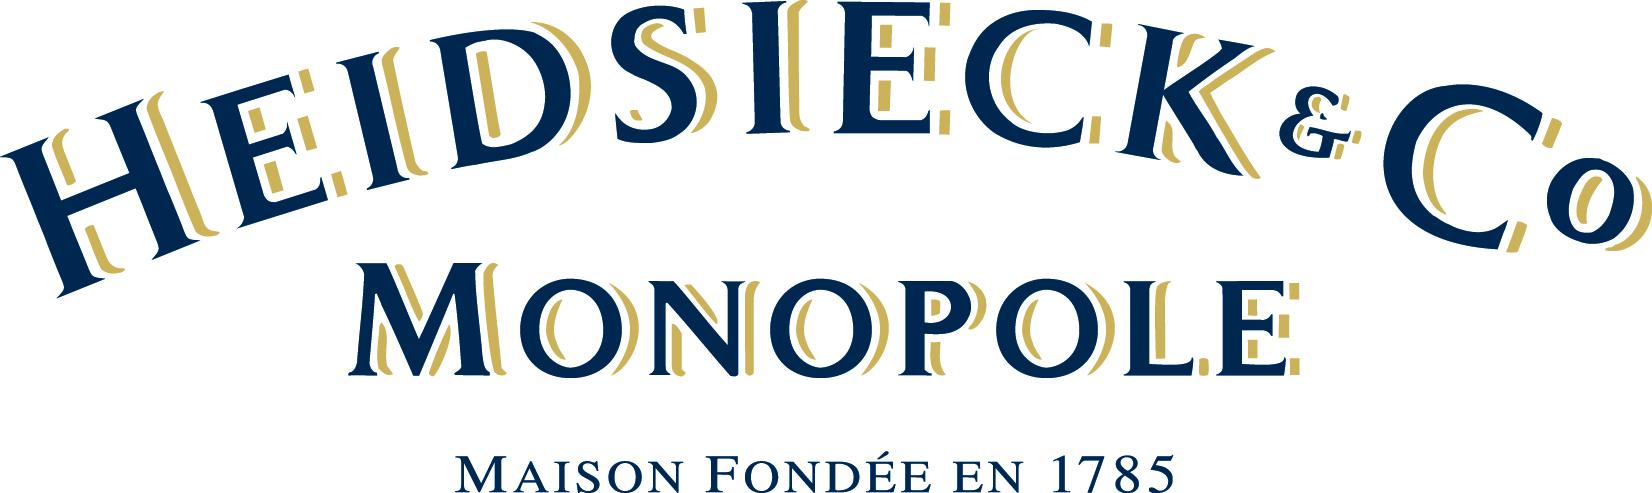 Heidsieck and Co Monopole Preis